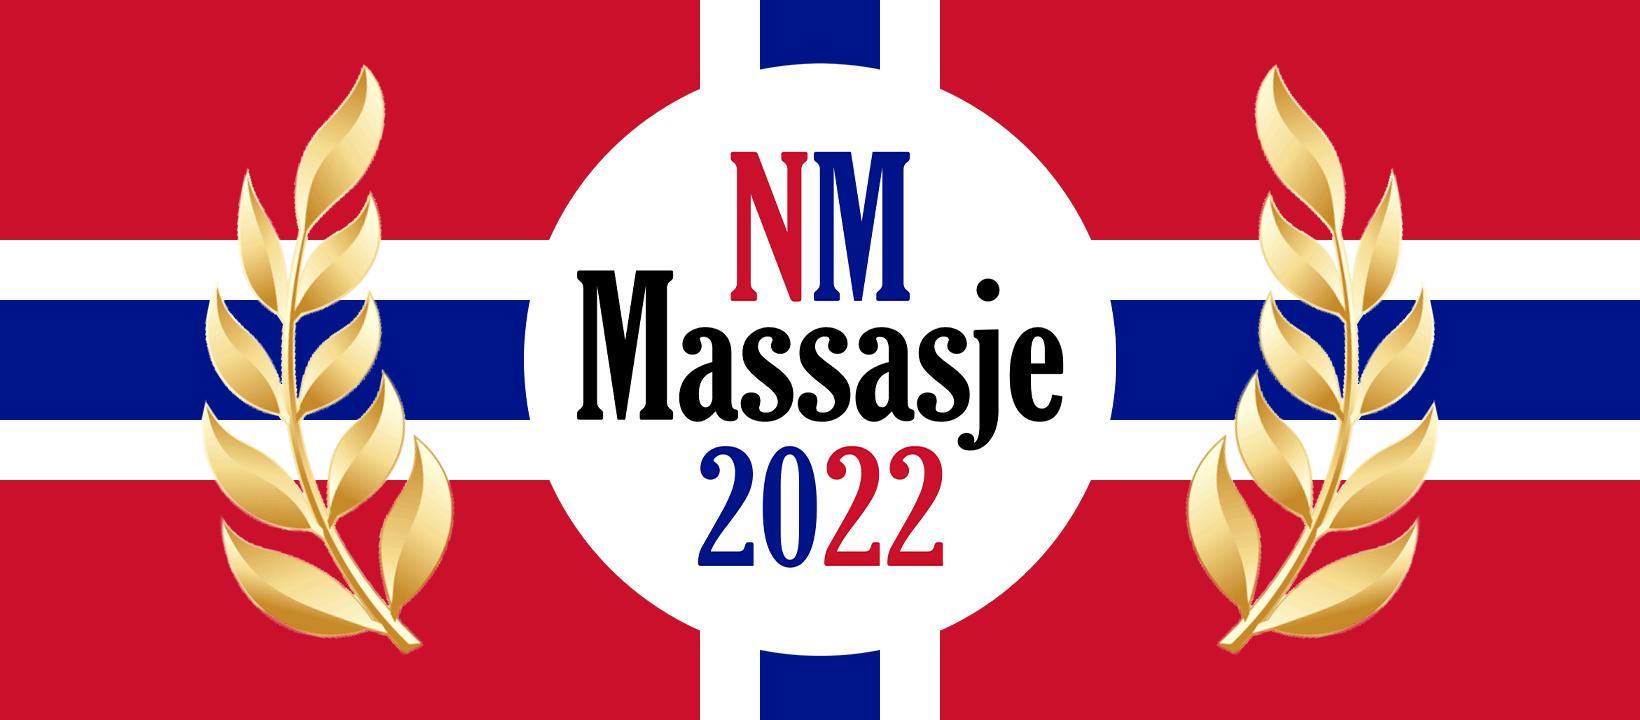 NM-Norgesmesterskapet-i-Massasje-2022-Logo-Facebook-Cover